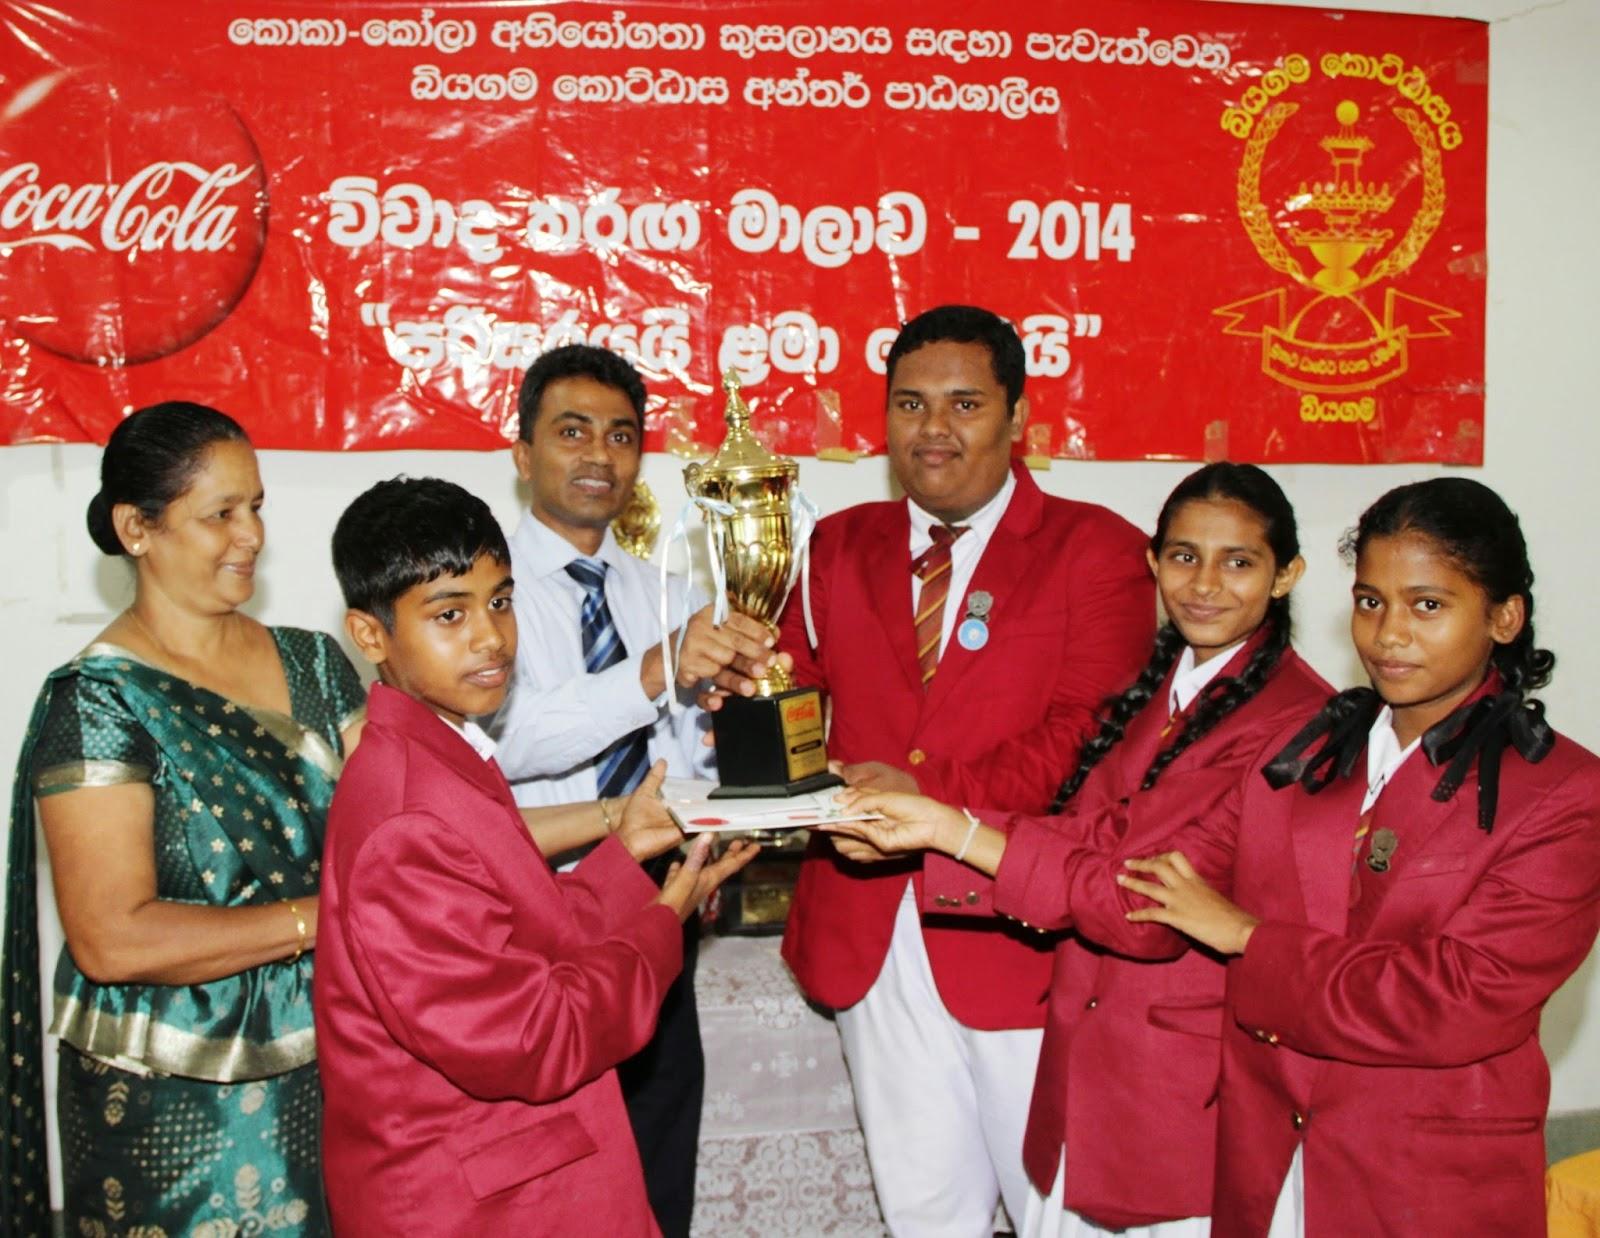 Ruwan Kumara Public Affairs and Communications and SRA Manager at Coca-Cola Beverages Sri Lanka Ltd hands over trophy to Victorious Siyamabalapewatte Kanishta Vidyalaya Team, winners of the second category